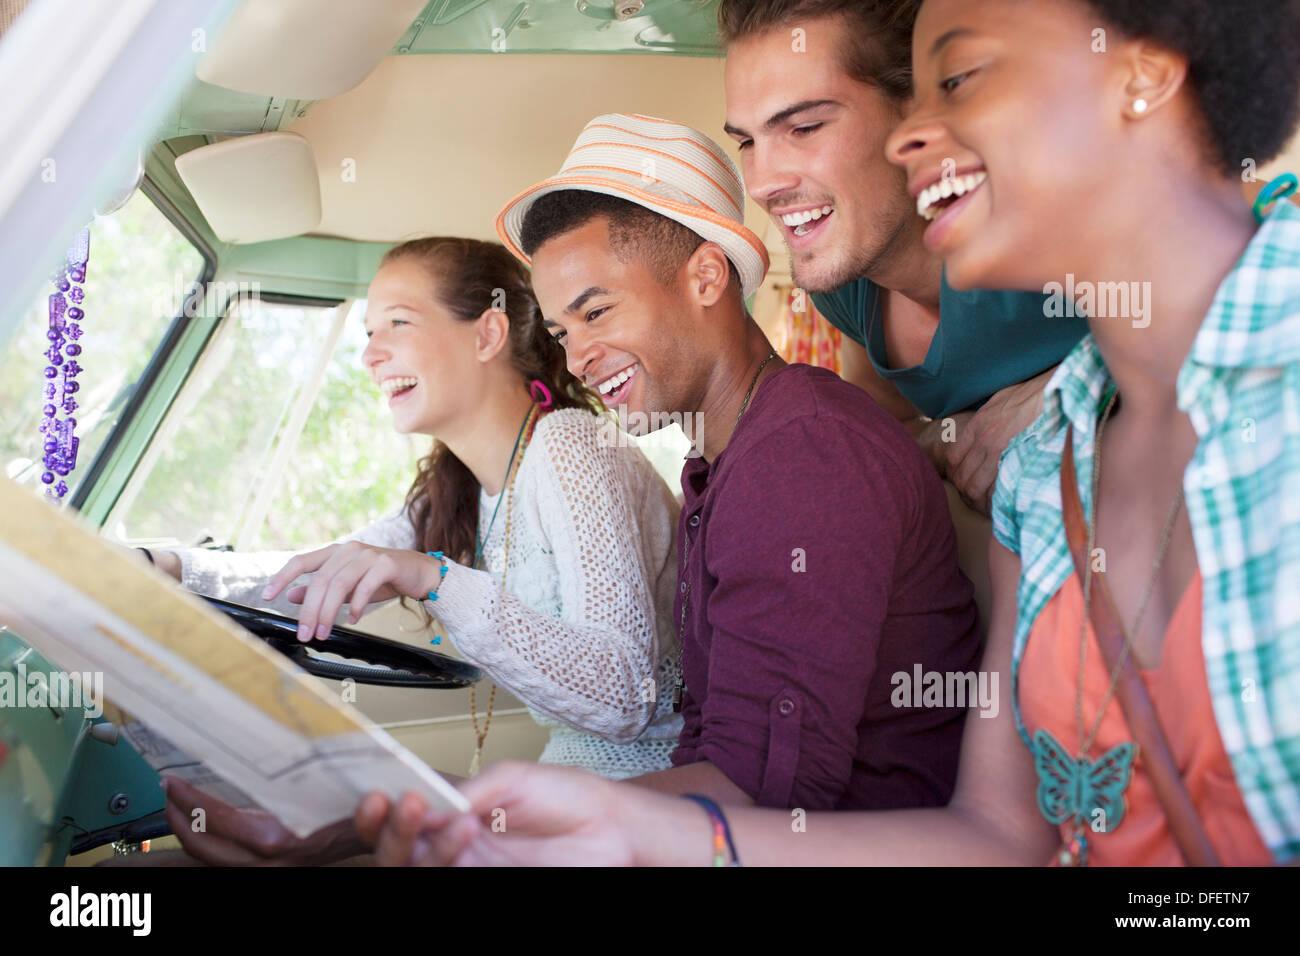 Amici sorridente in van Immagini Stock